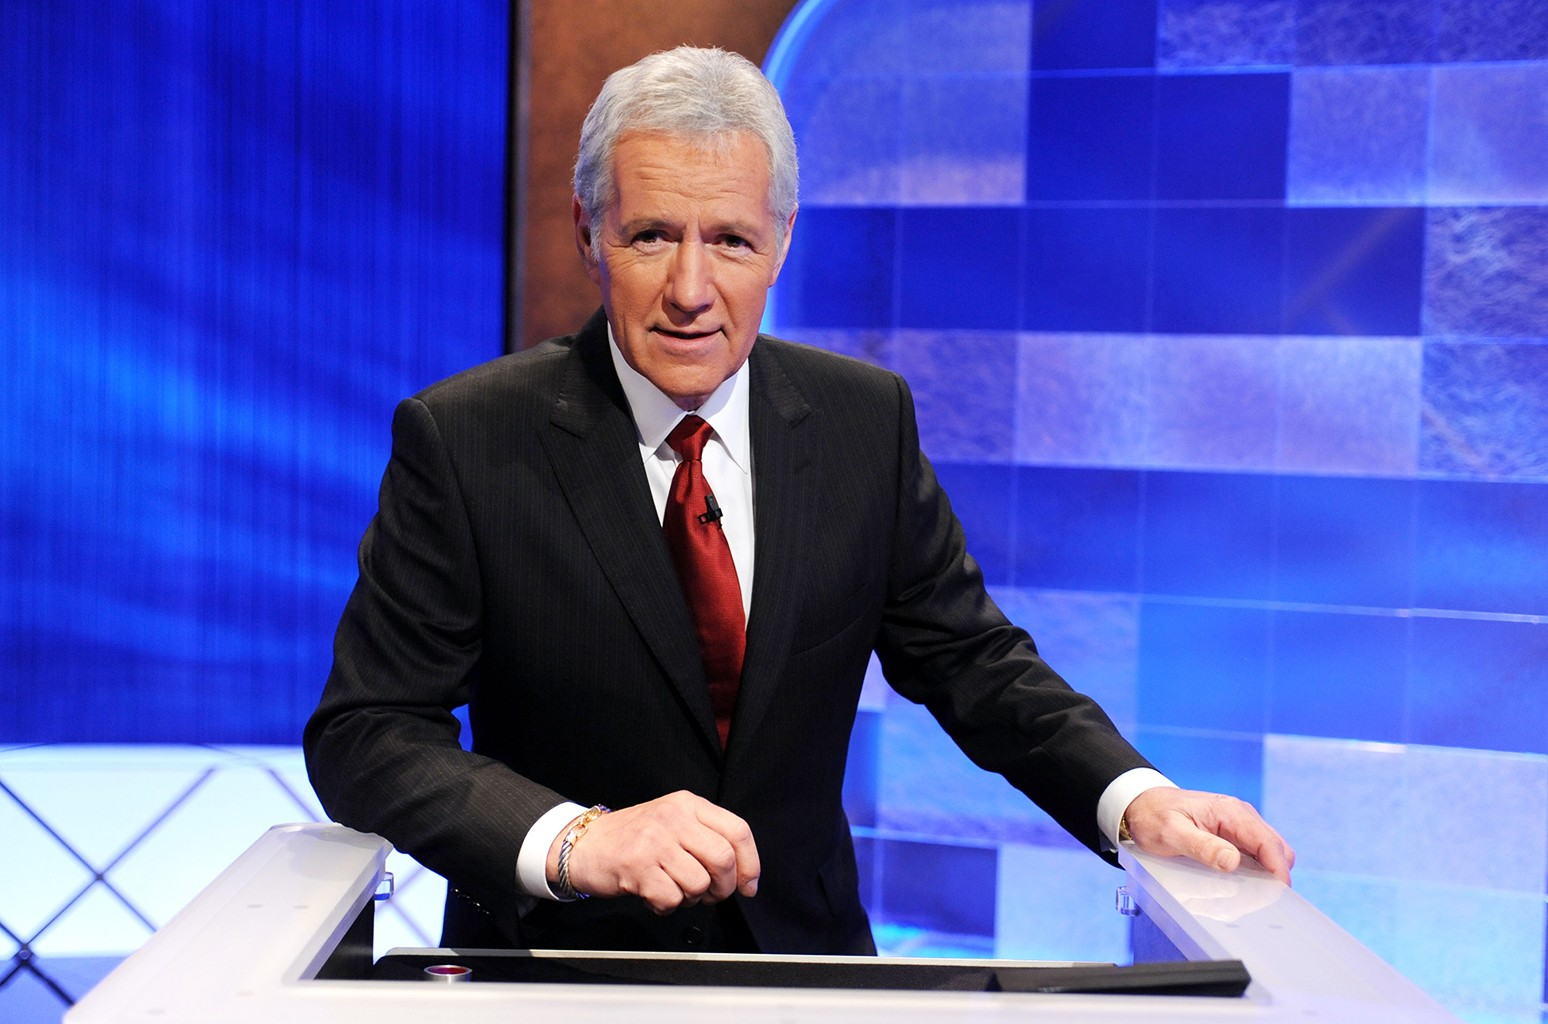 Alex Trebek poses on the set of the Jeopardy!